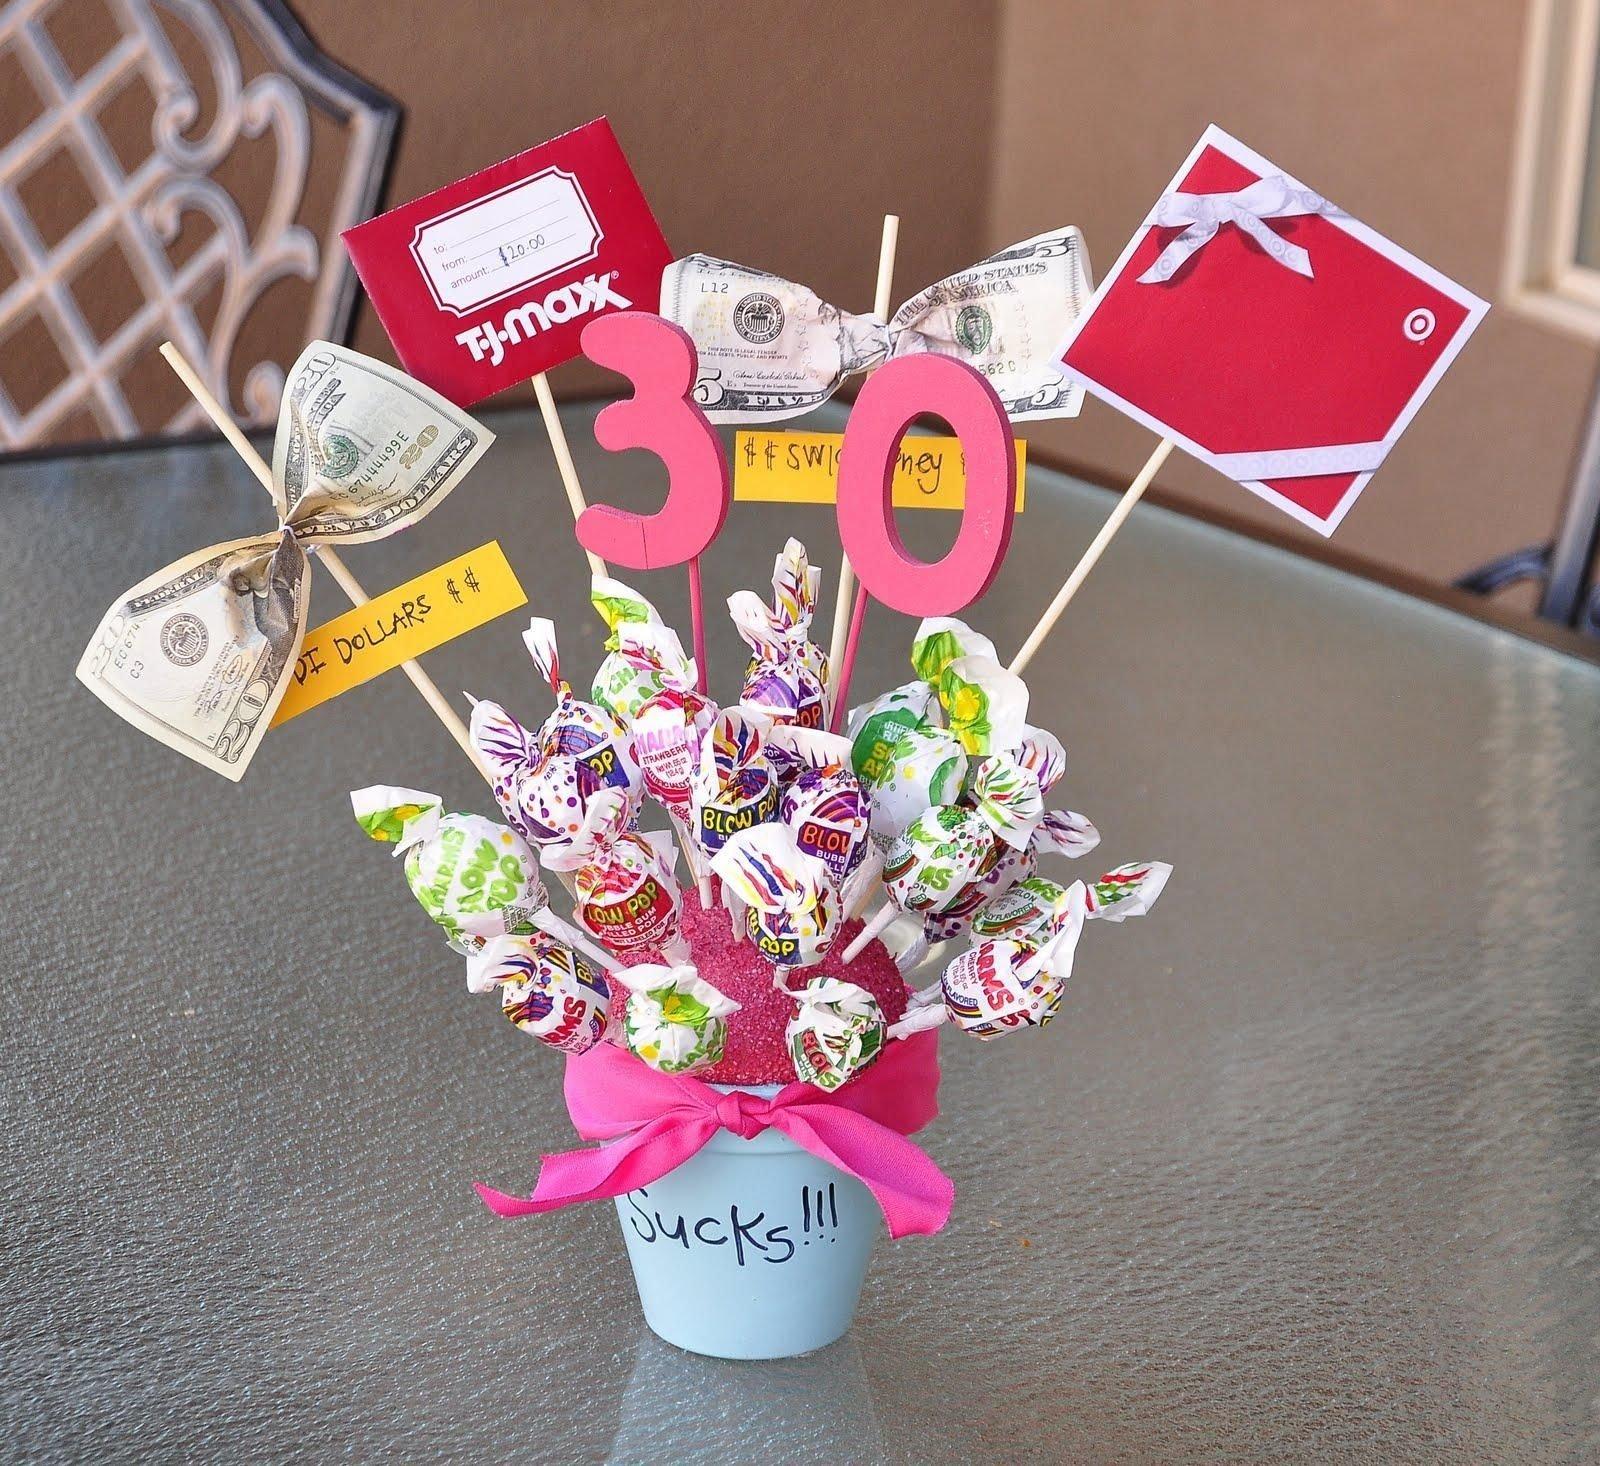 10 Fashionable Gift Ideas For Female Friends birthday gift ideas for friends female google search gift ideas 2 2020